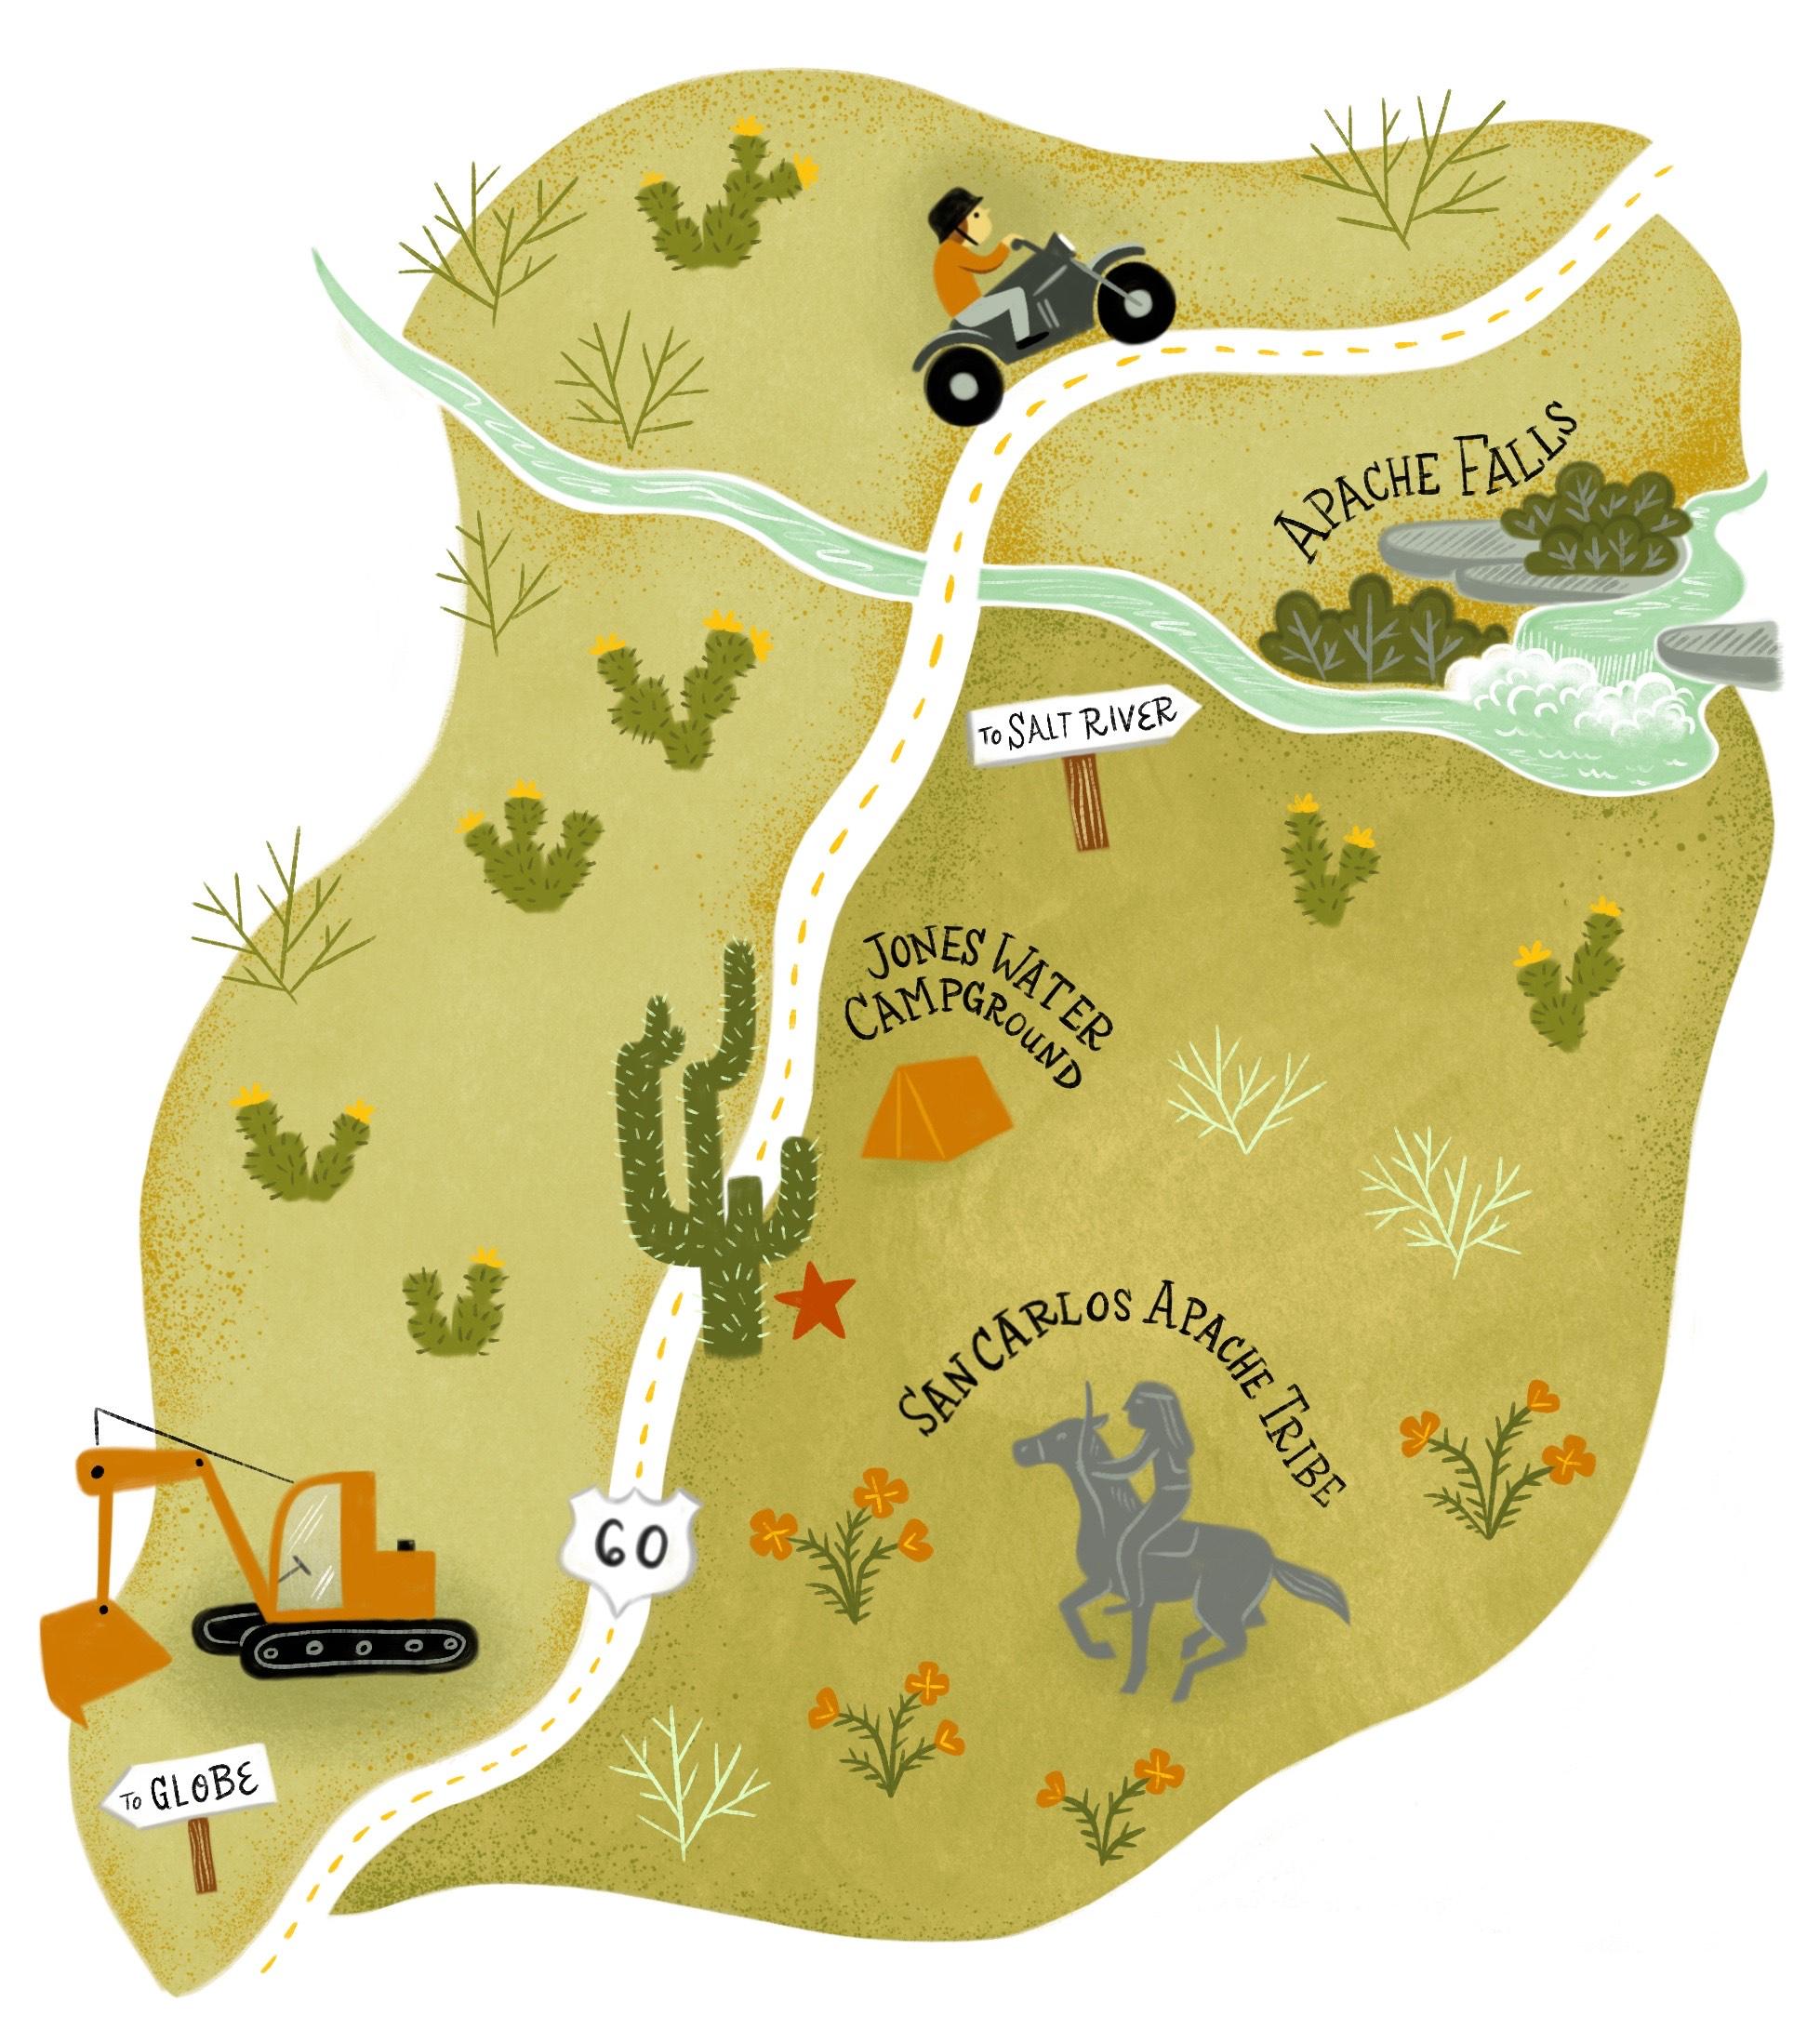 US 60 saguaro cactus map